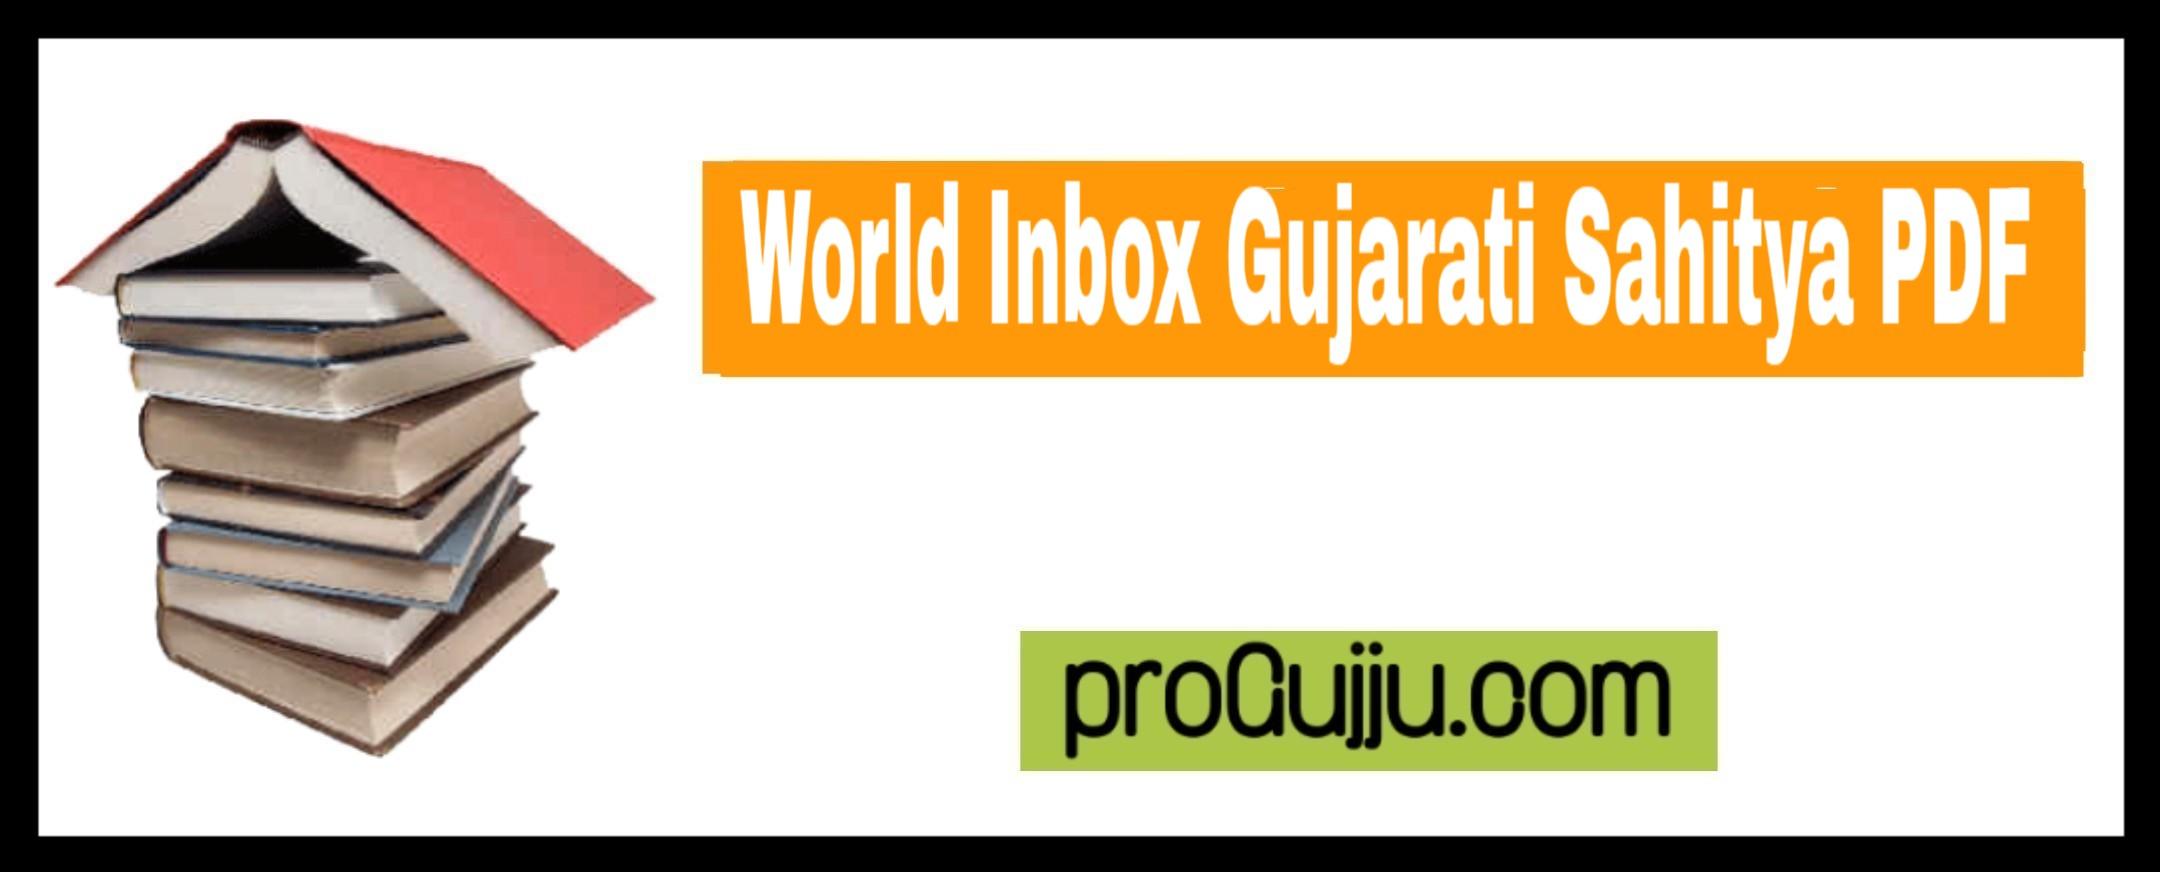 World Inbox Gujarati Sahitya Pdf